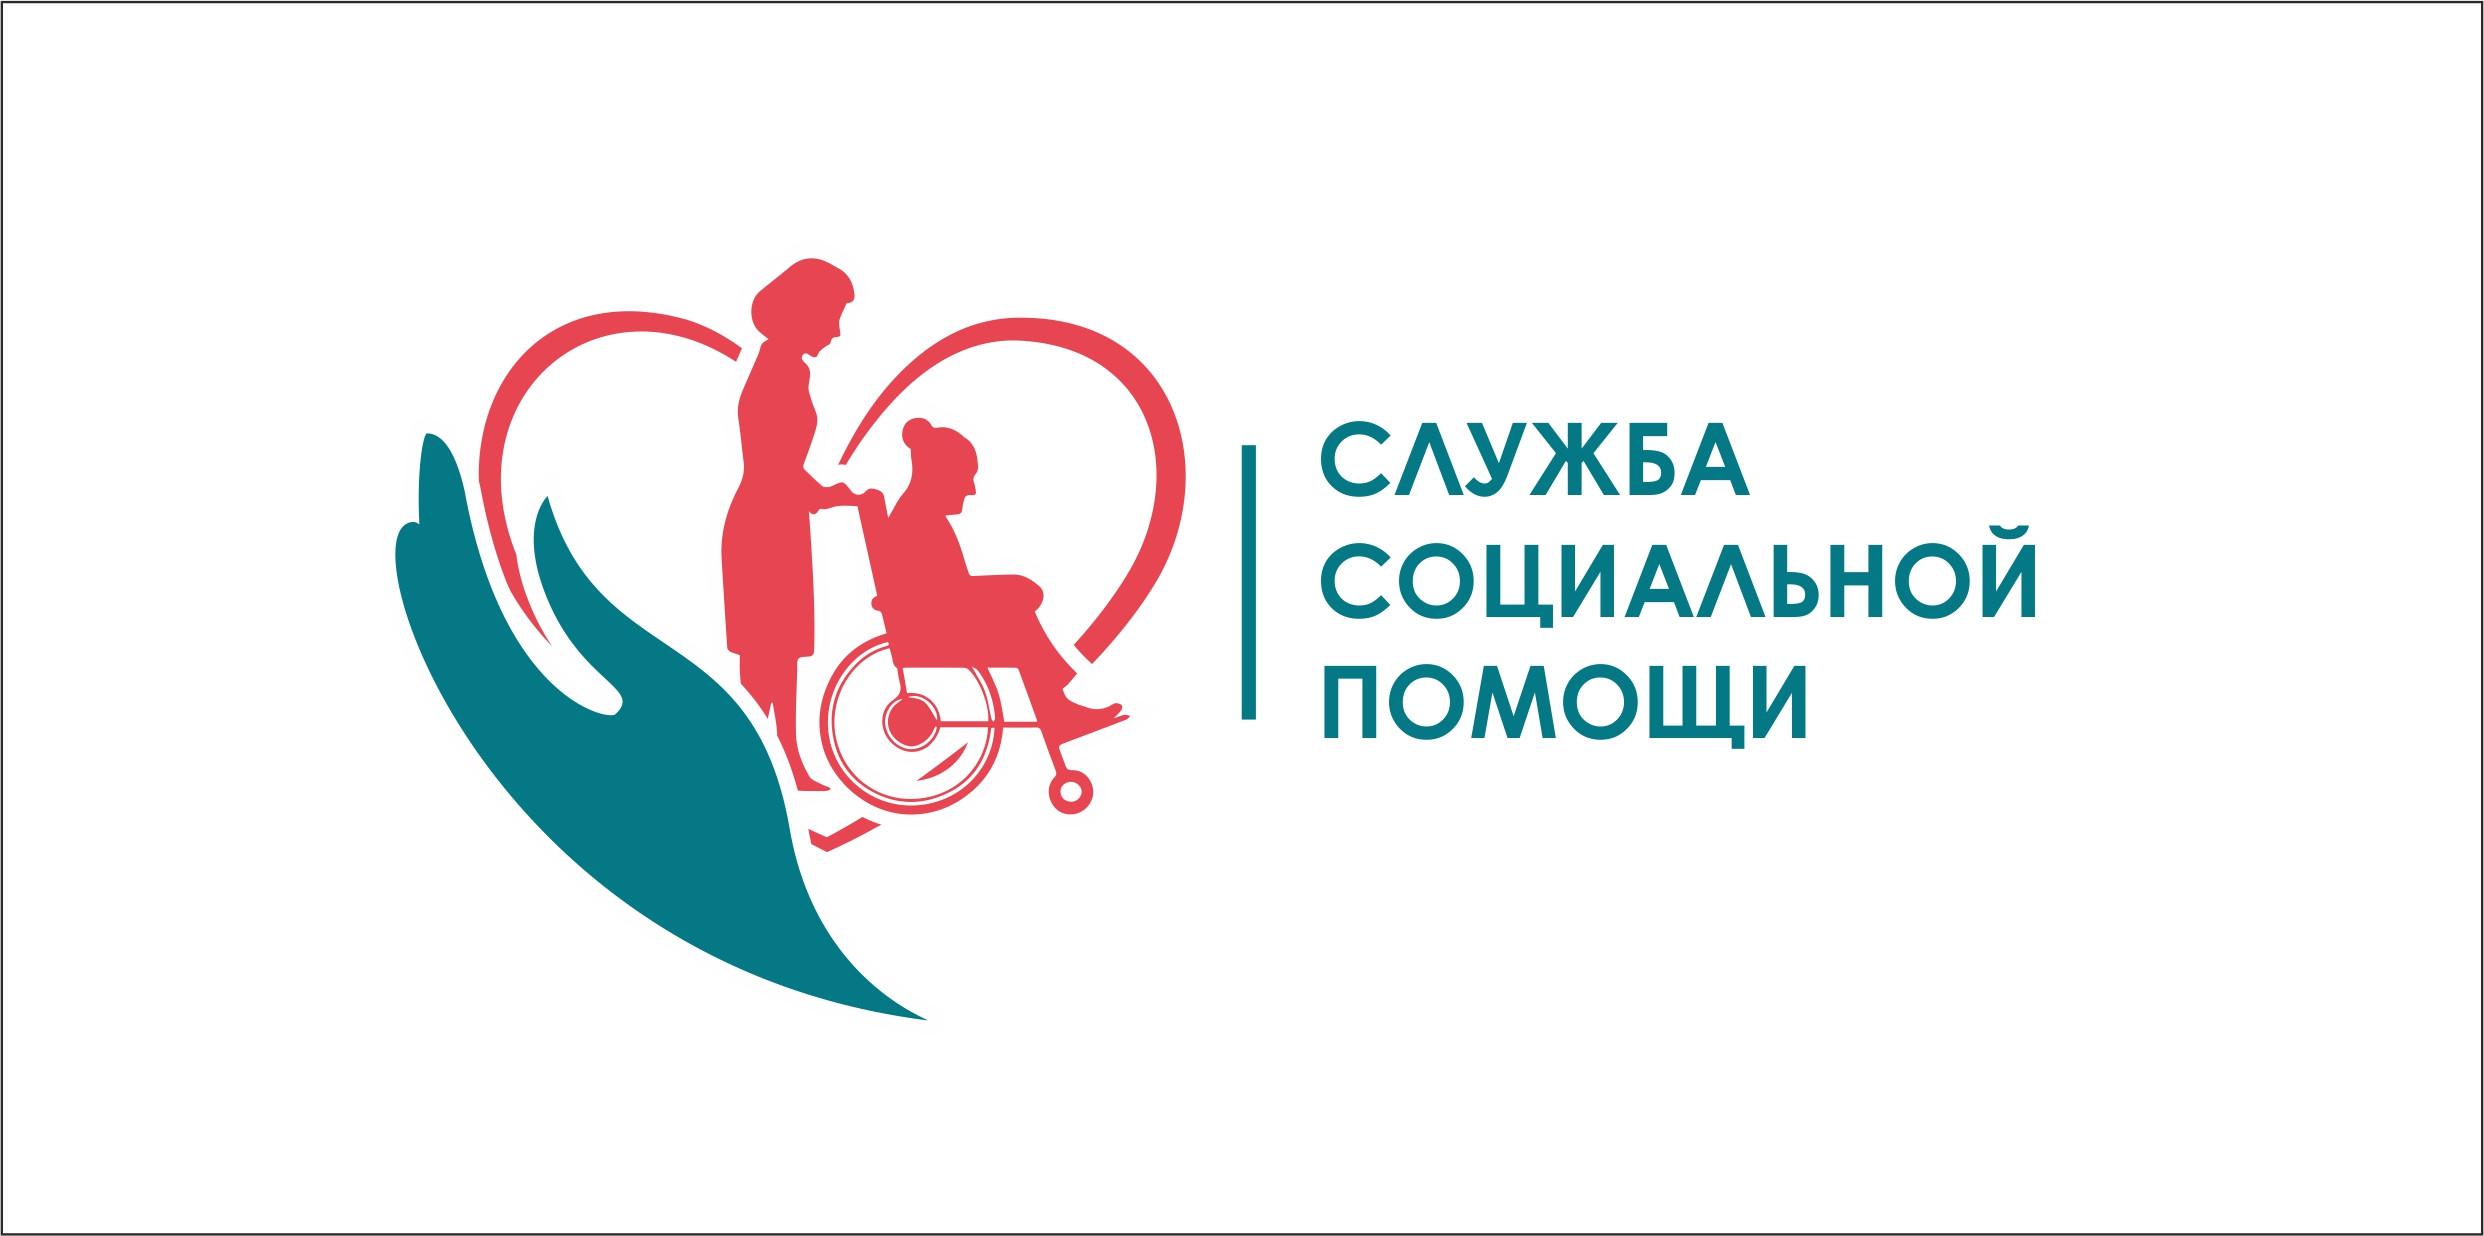 Патронажная служба Москвы «ОВИРТОН-мед»: услуги и цены